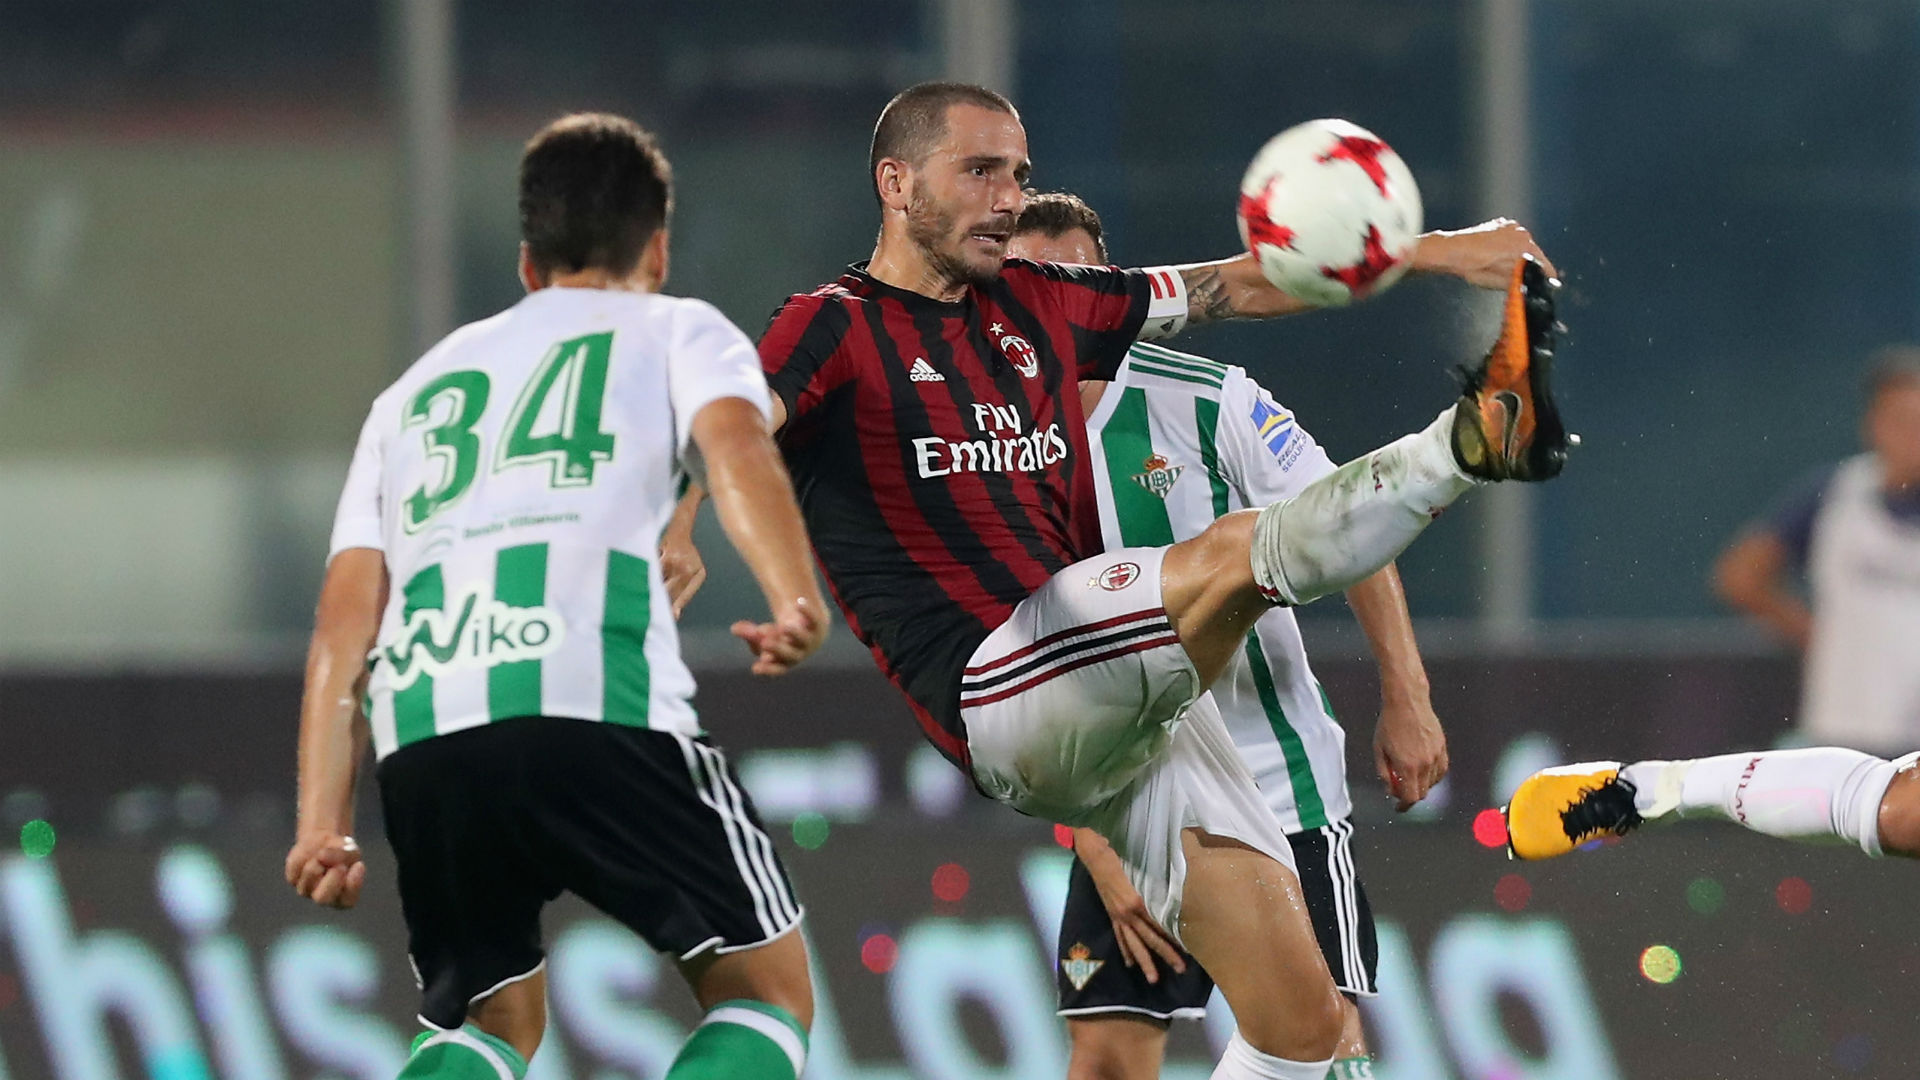 bonucci captain - milan betis - friendly - 0908201